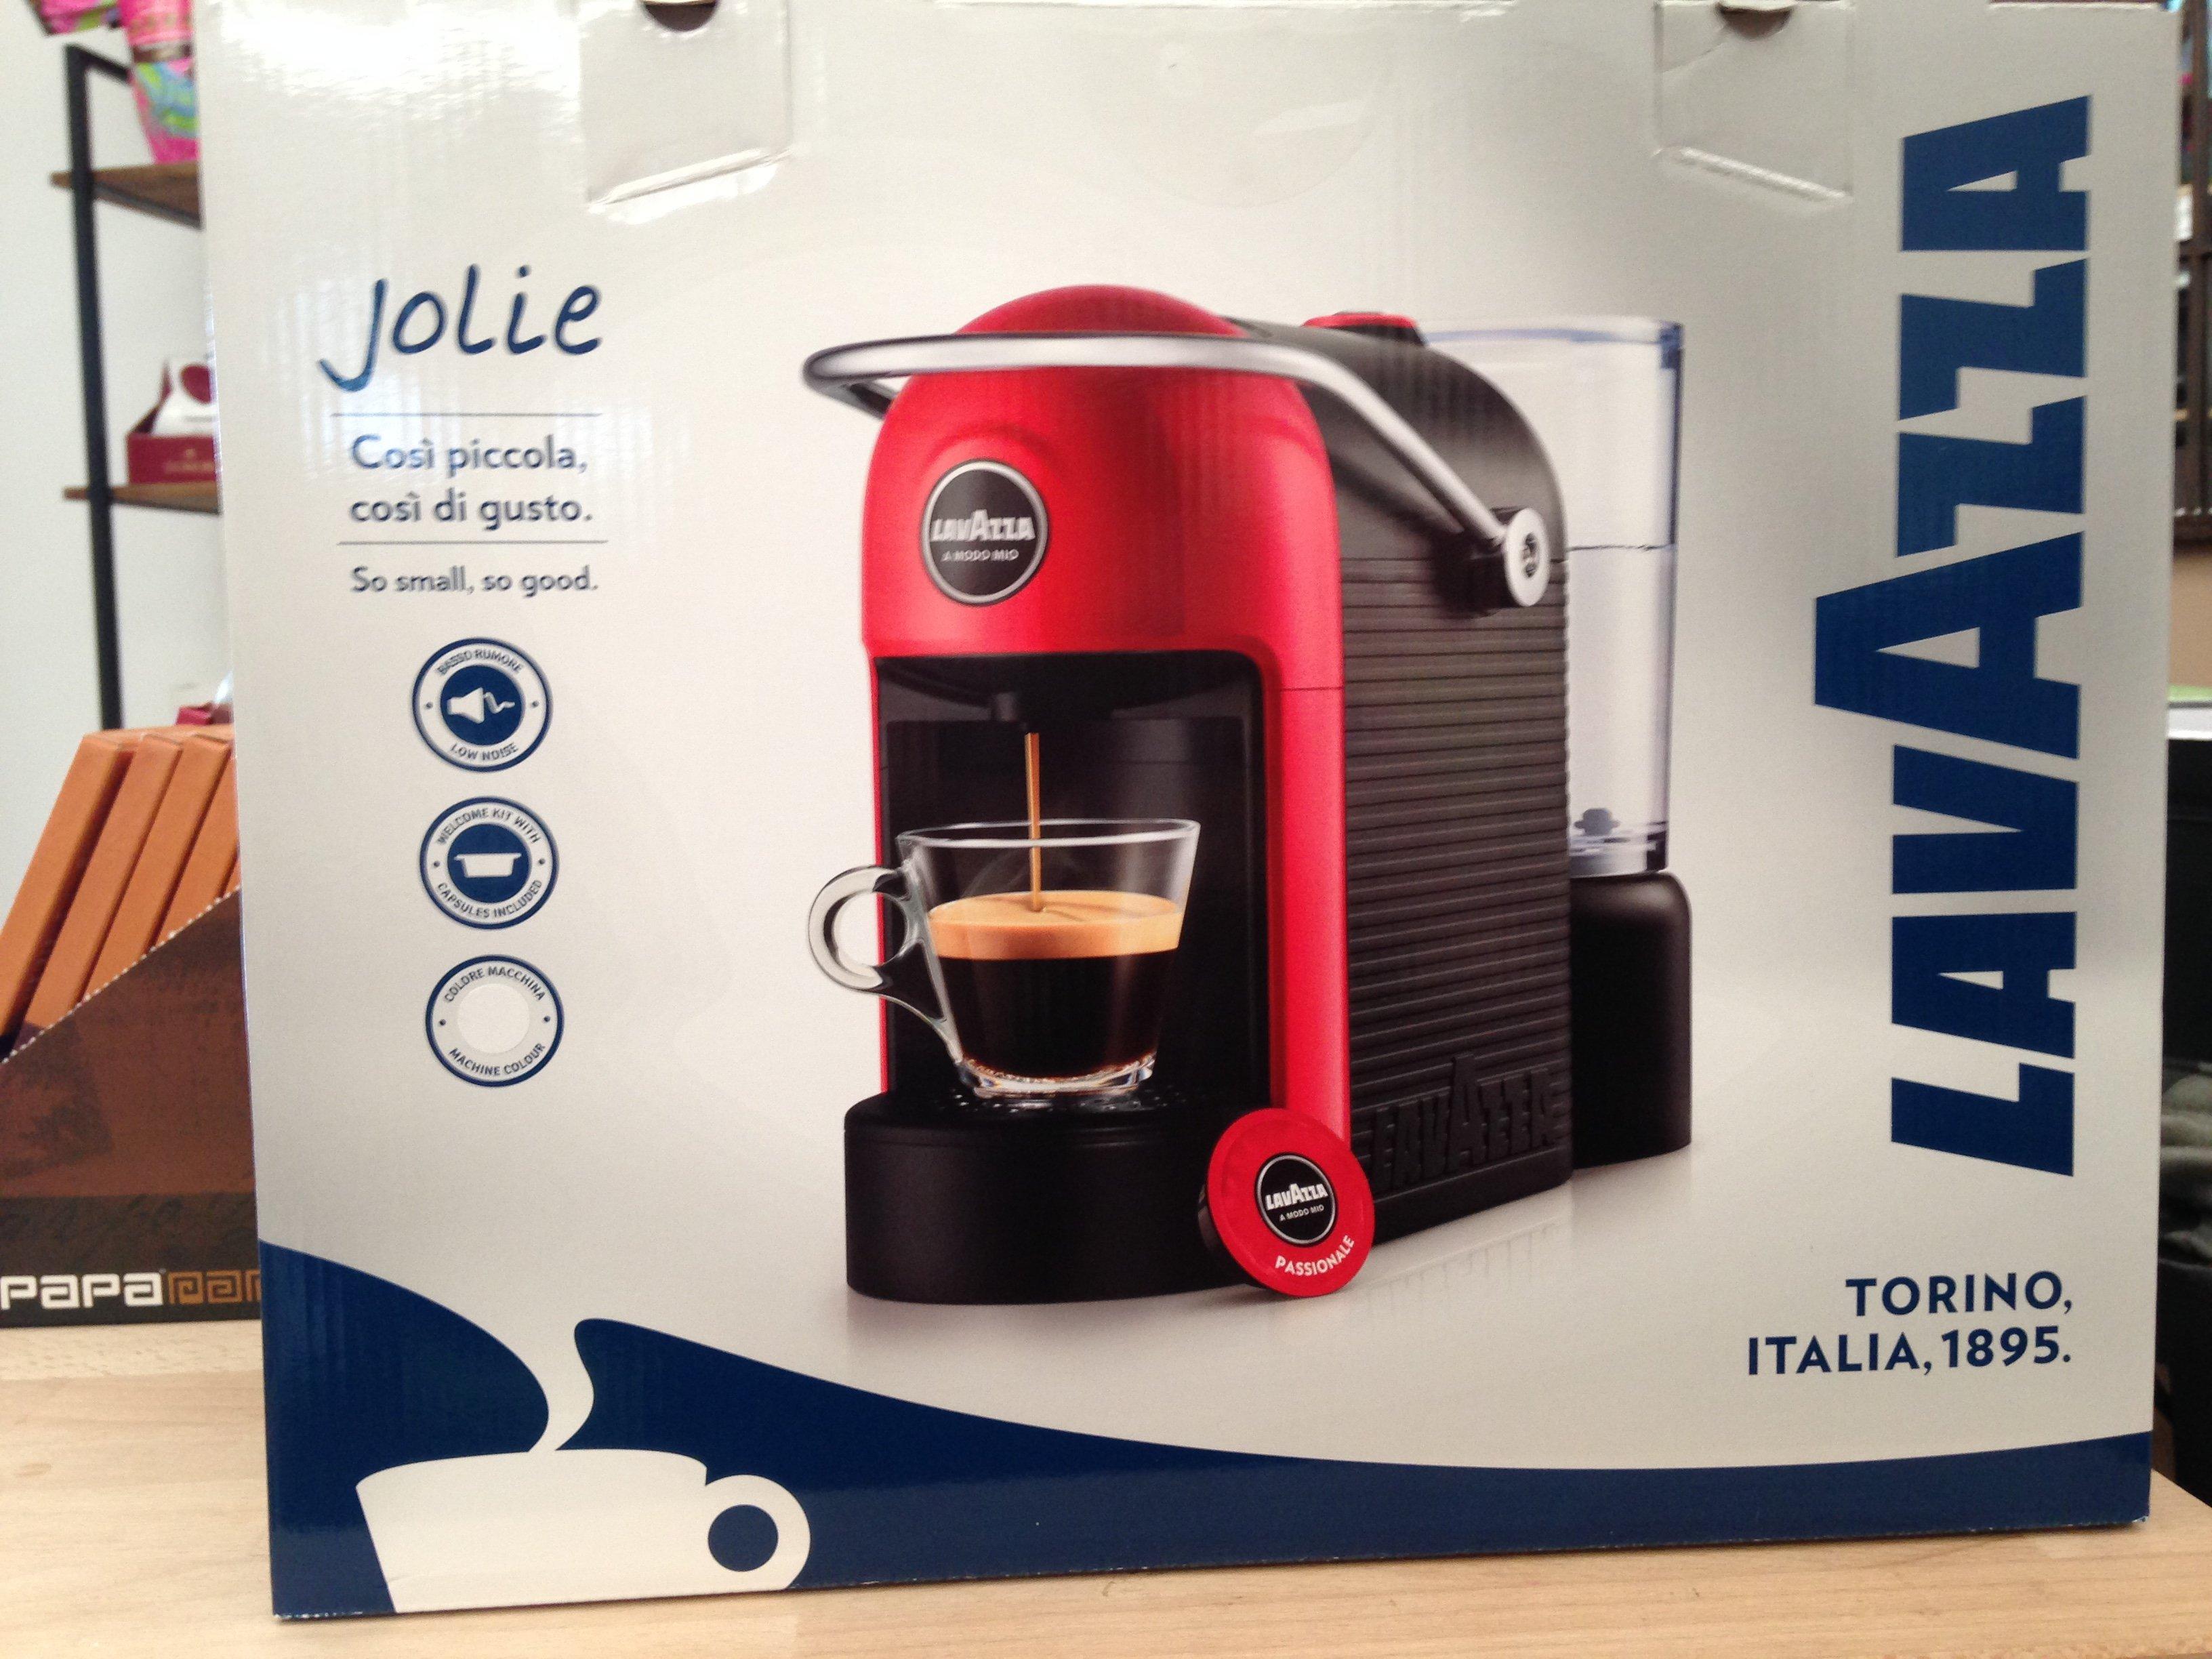 macchina da caffé Jolie per Lavazza